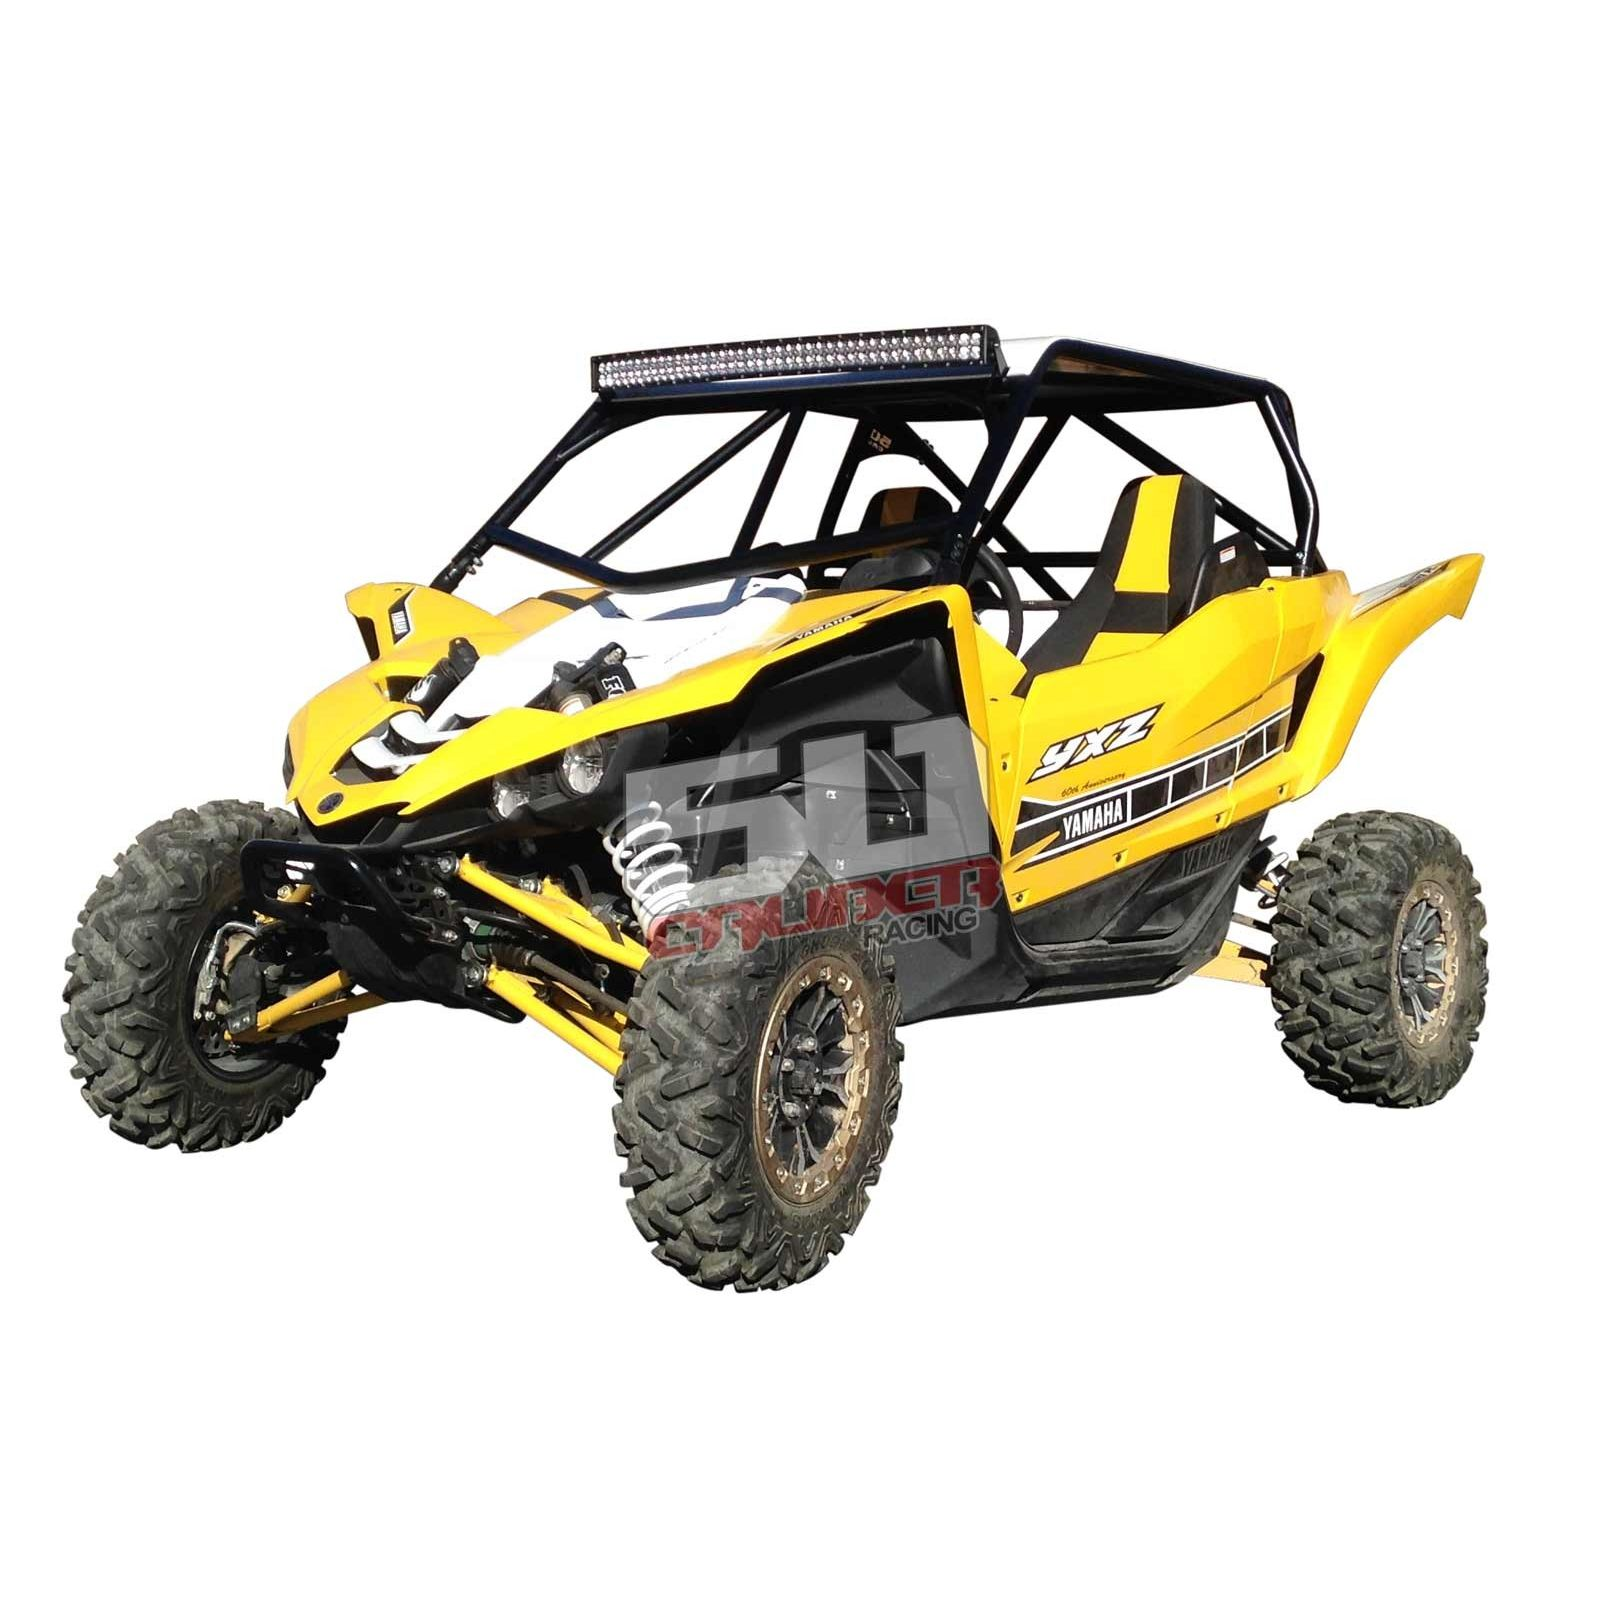 Custom Roll Cage Xp1000 Turbo Rhino Viking Yxz1000r Maverick Wildcat 52cc Scooterx Power Kart Go With Aluminum Roof Yamaha 2 Seat